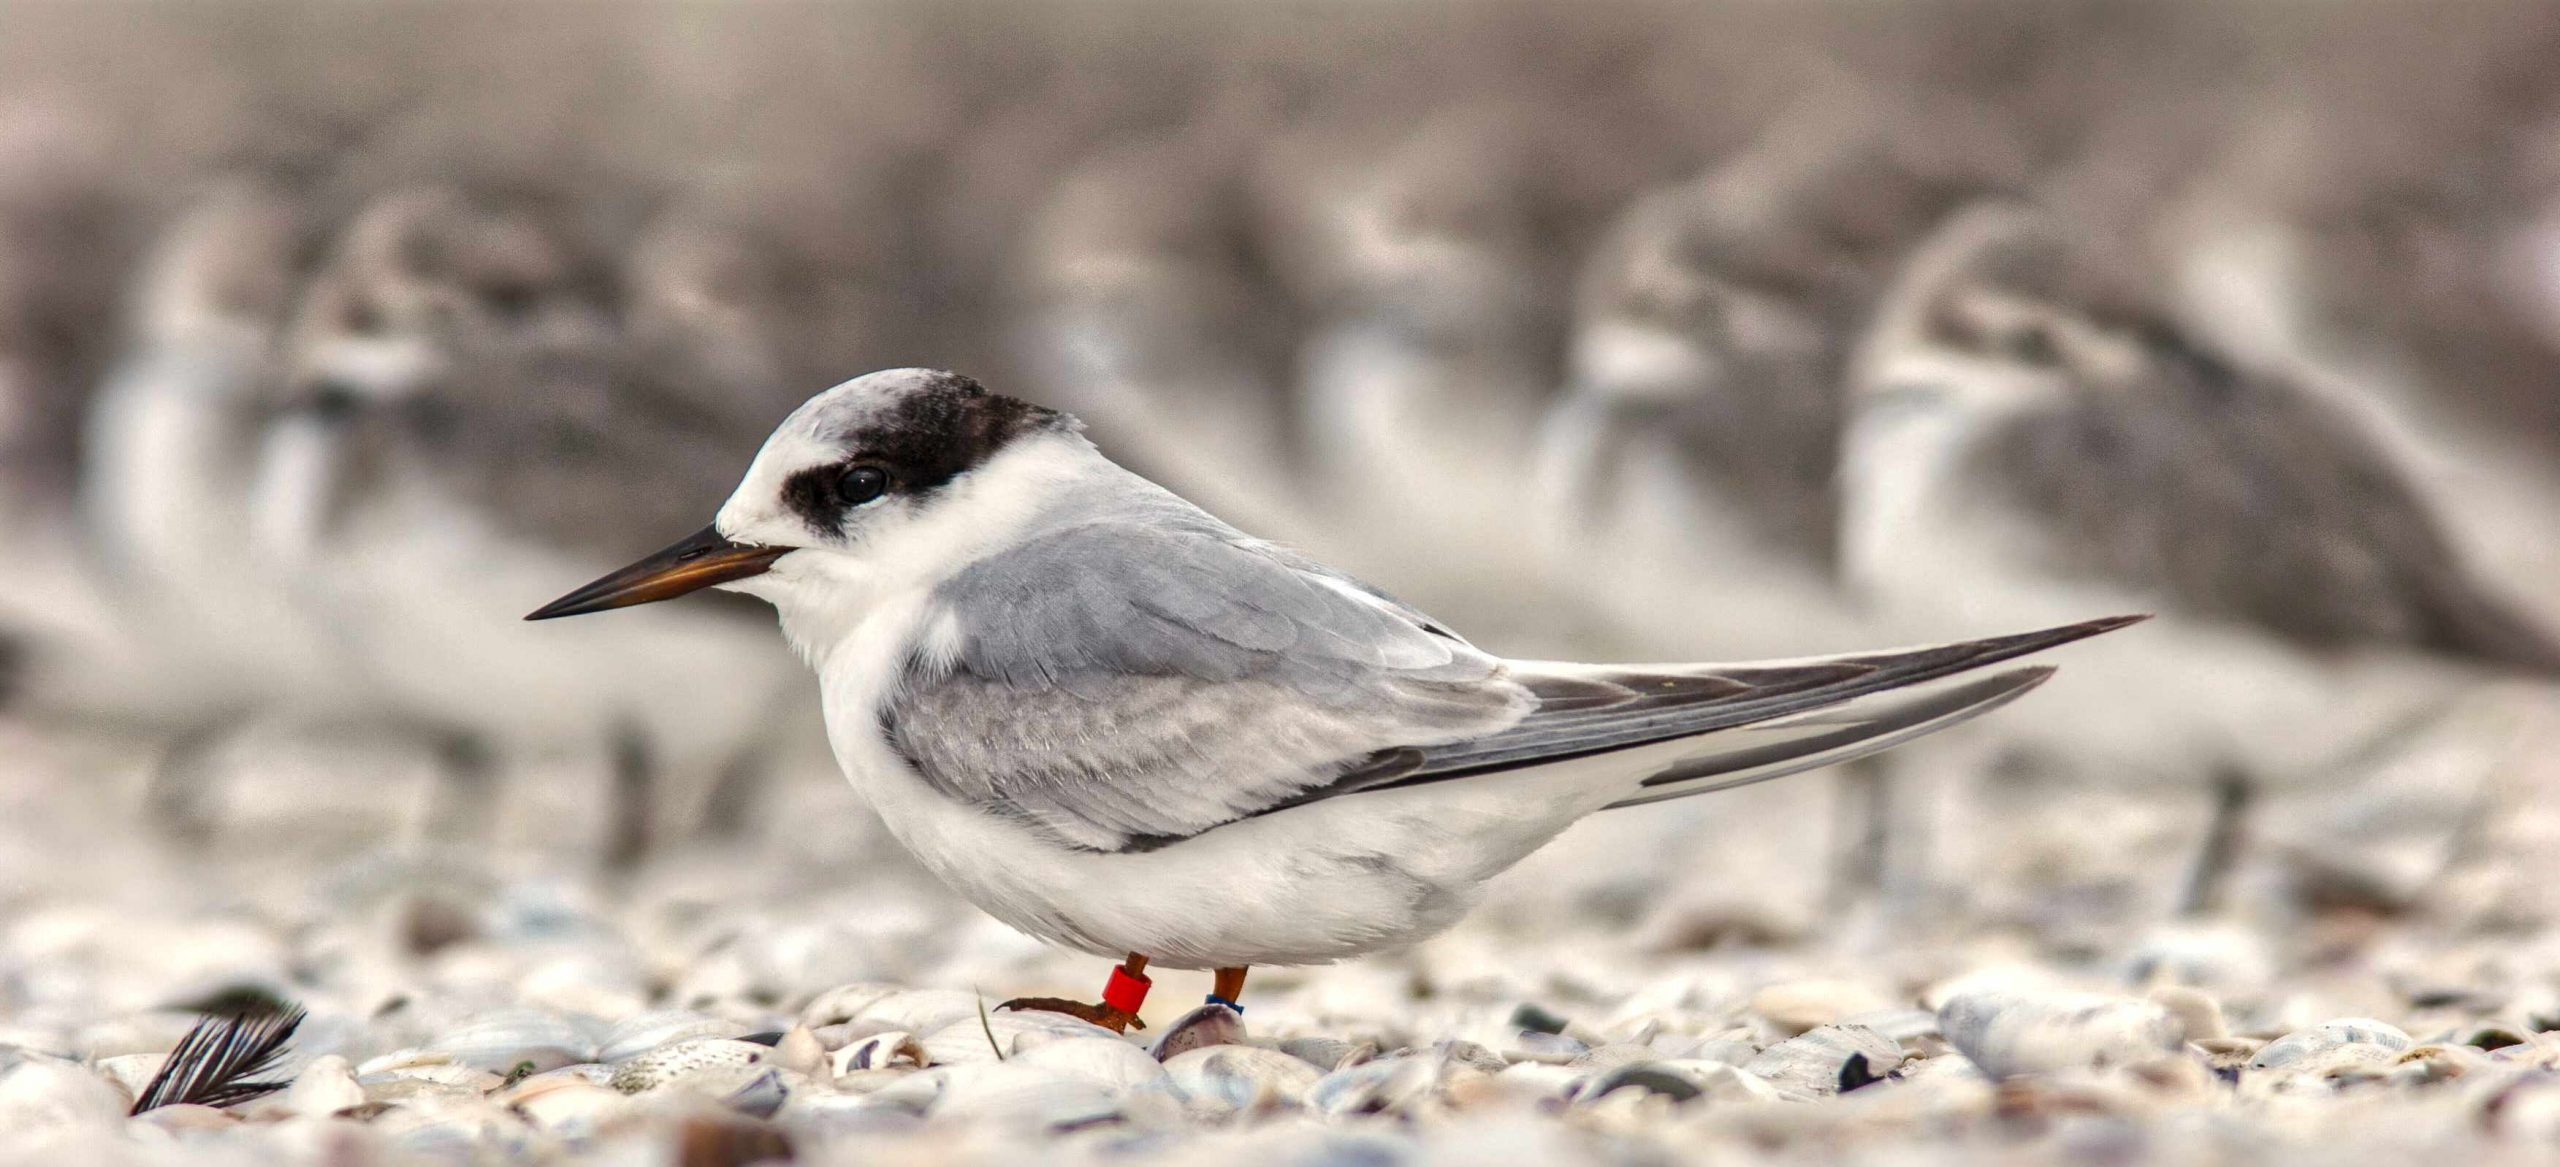 Raukaka Wildlife Reserve, Fairy Tern, v endangered, less than 50 pairs